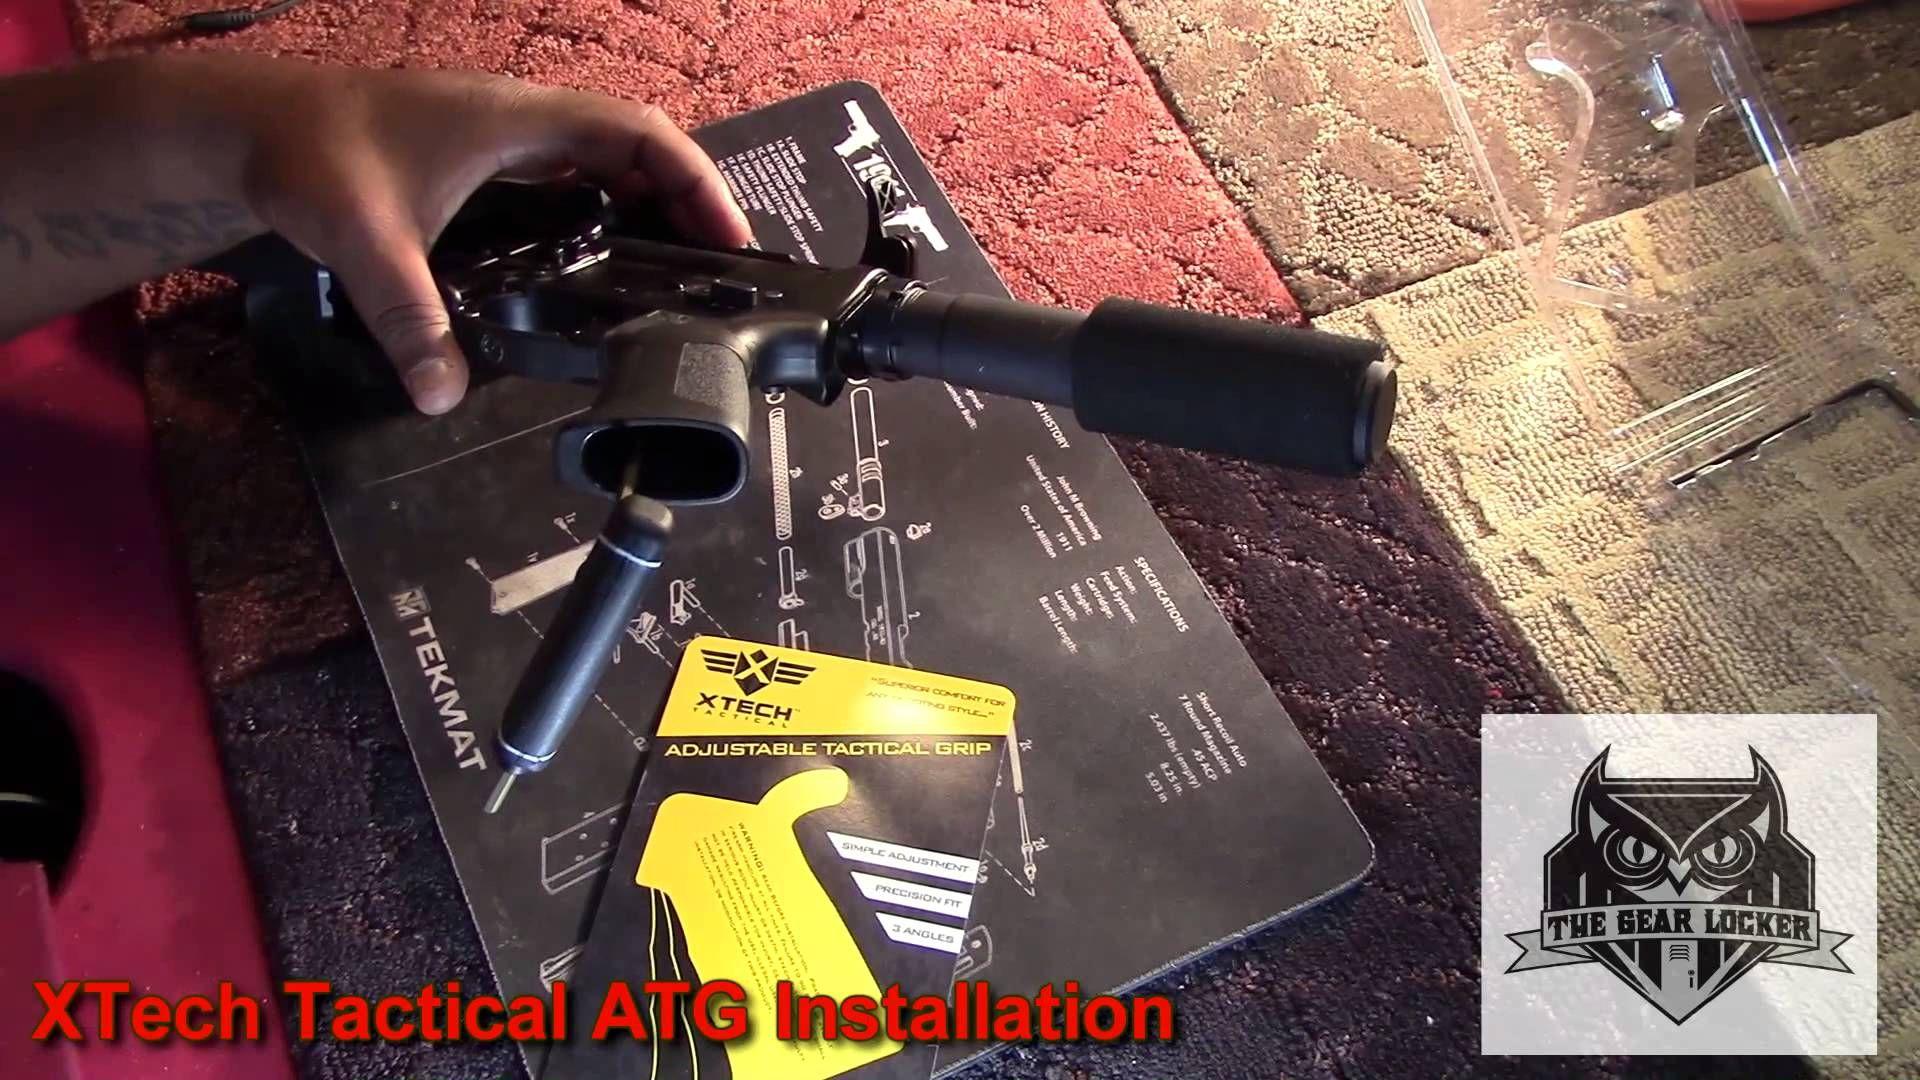 XTech Tactical ATG Installation vid by TheGearLocker net